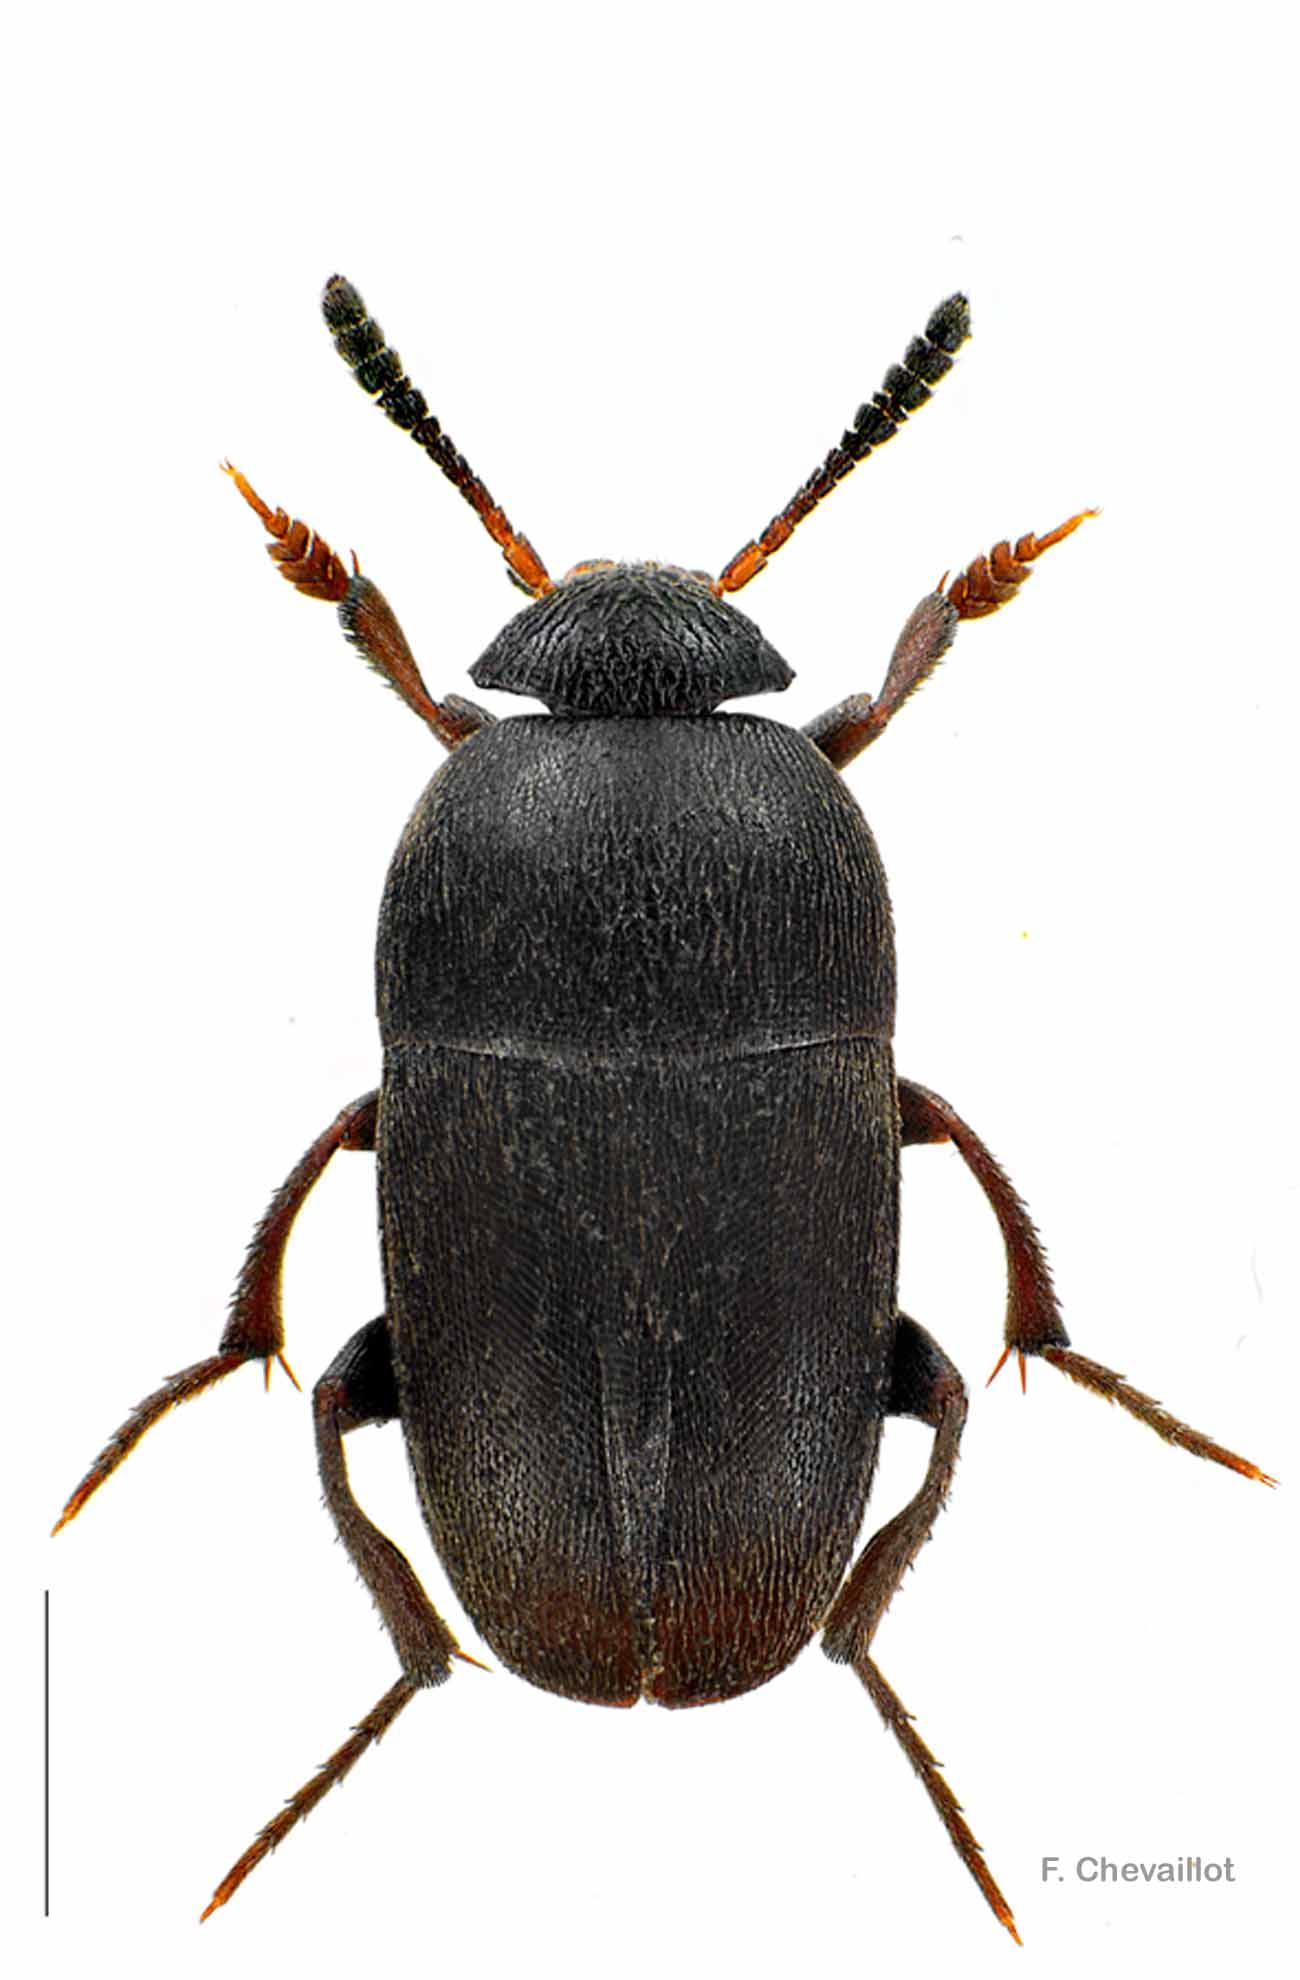 Ptomaphagus subvillosus